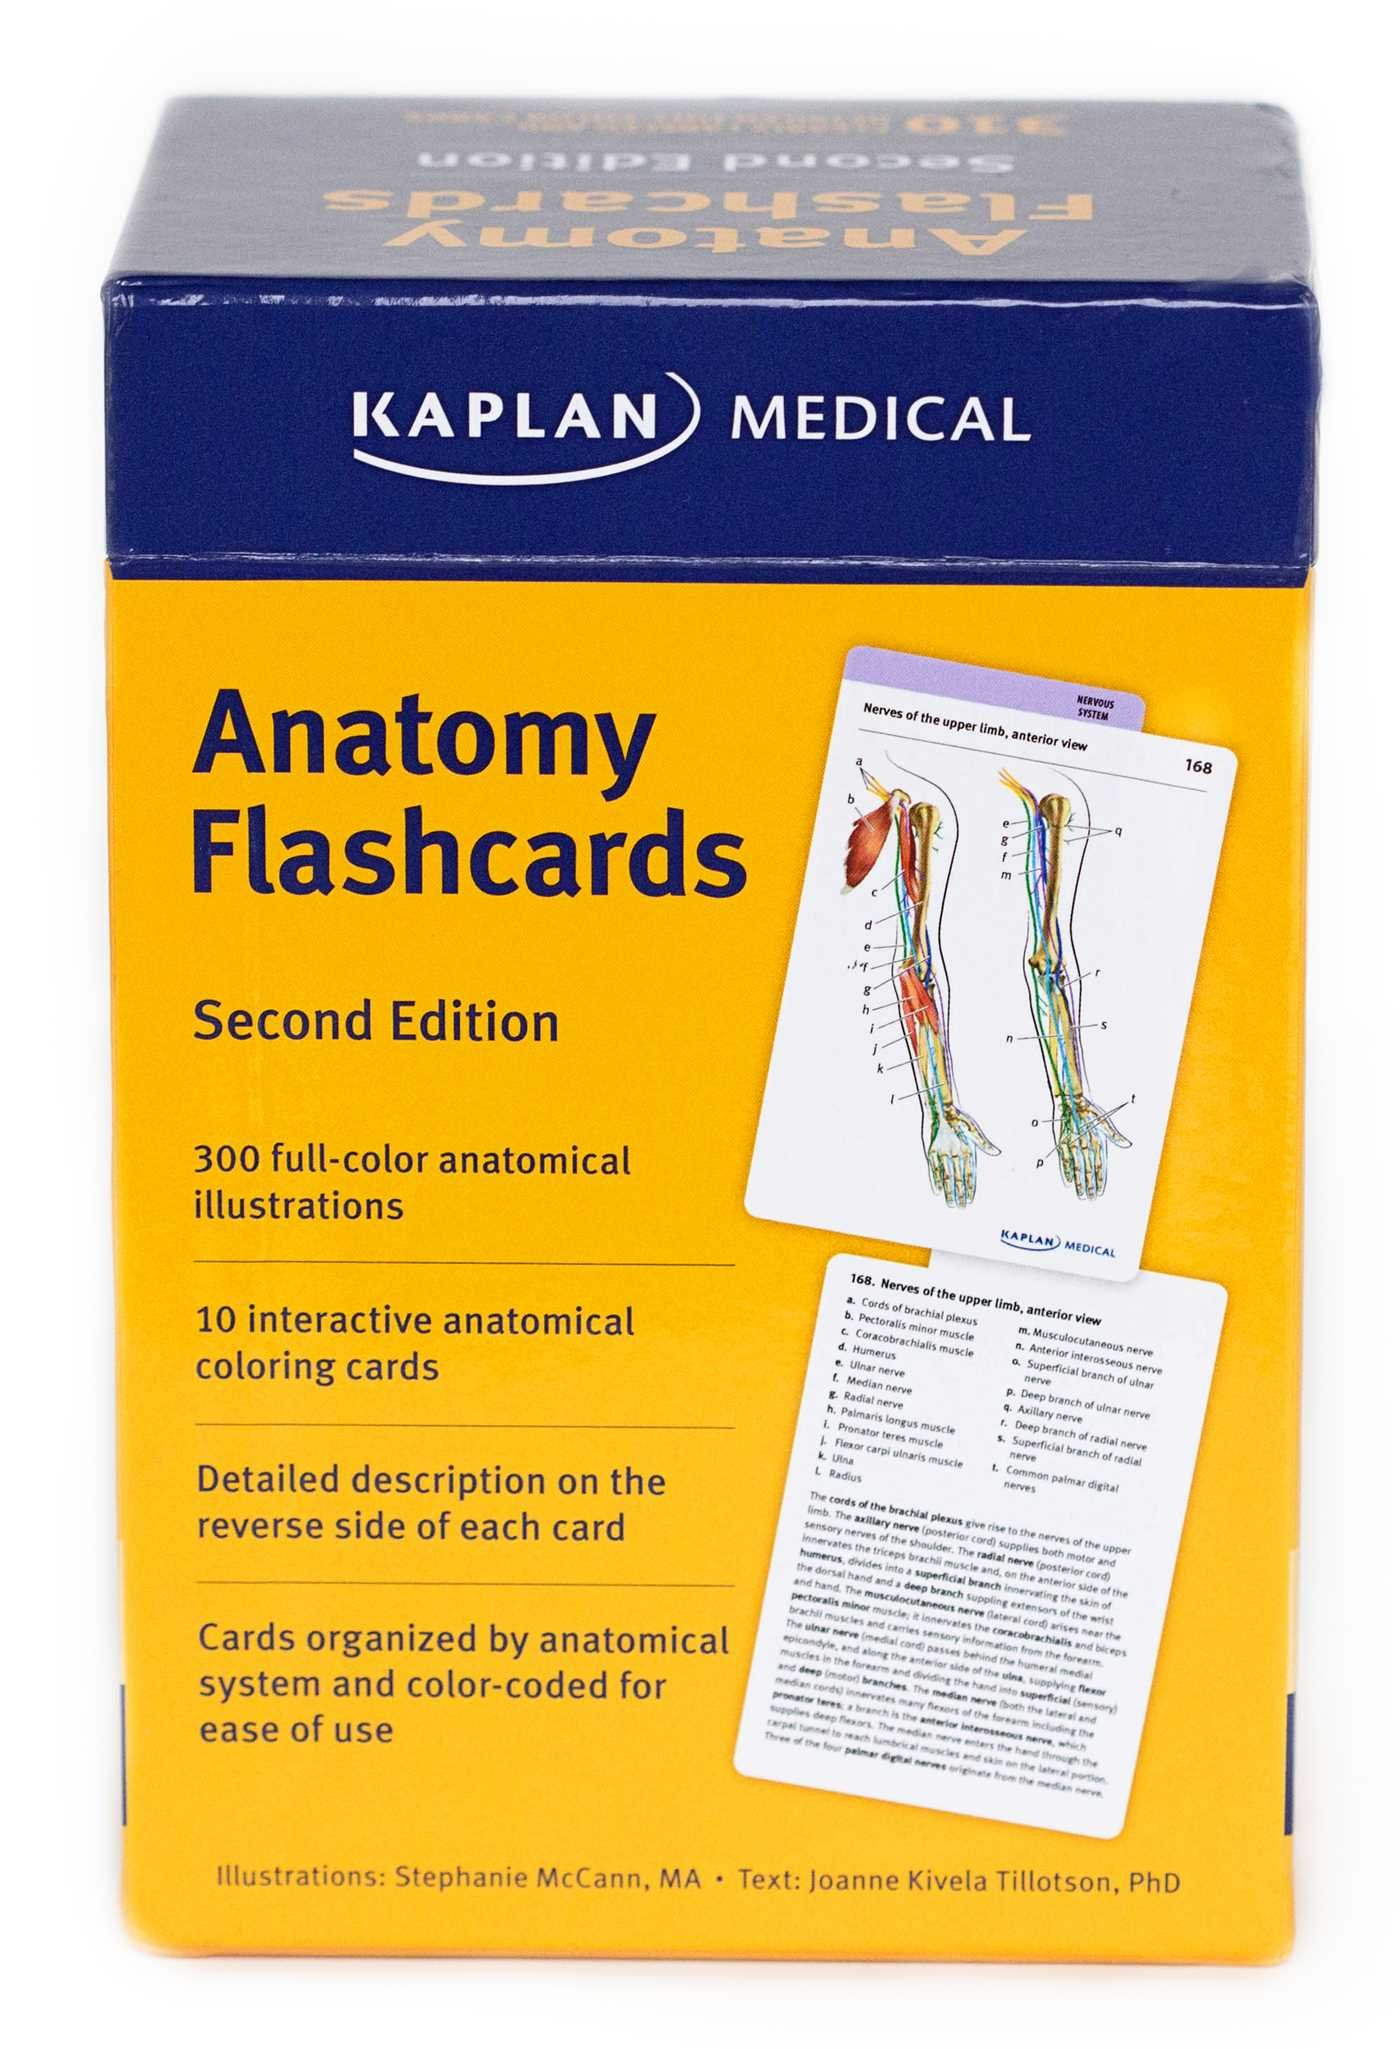 The physiology coloring book kapit - Anatomy Flashcards Joanne Tillotson Stephanie Mccann 9781607149842 Books Amazon Ca